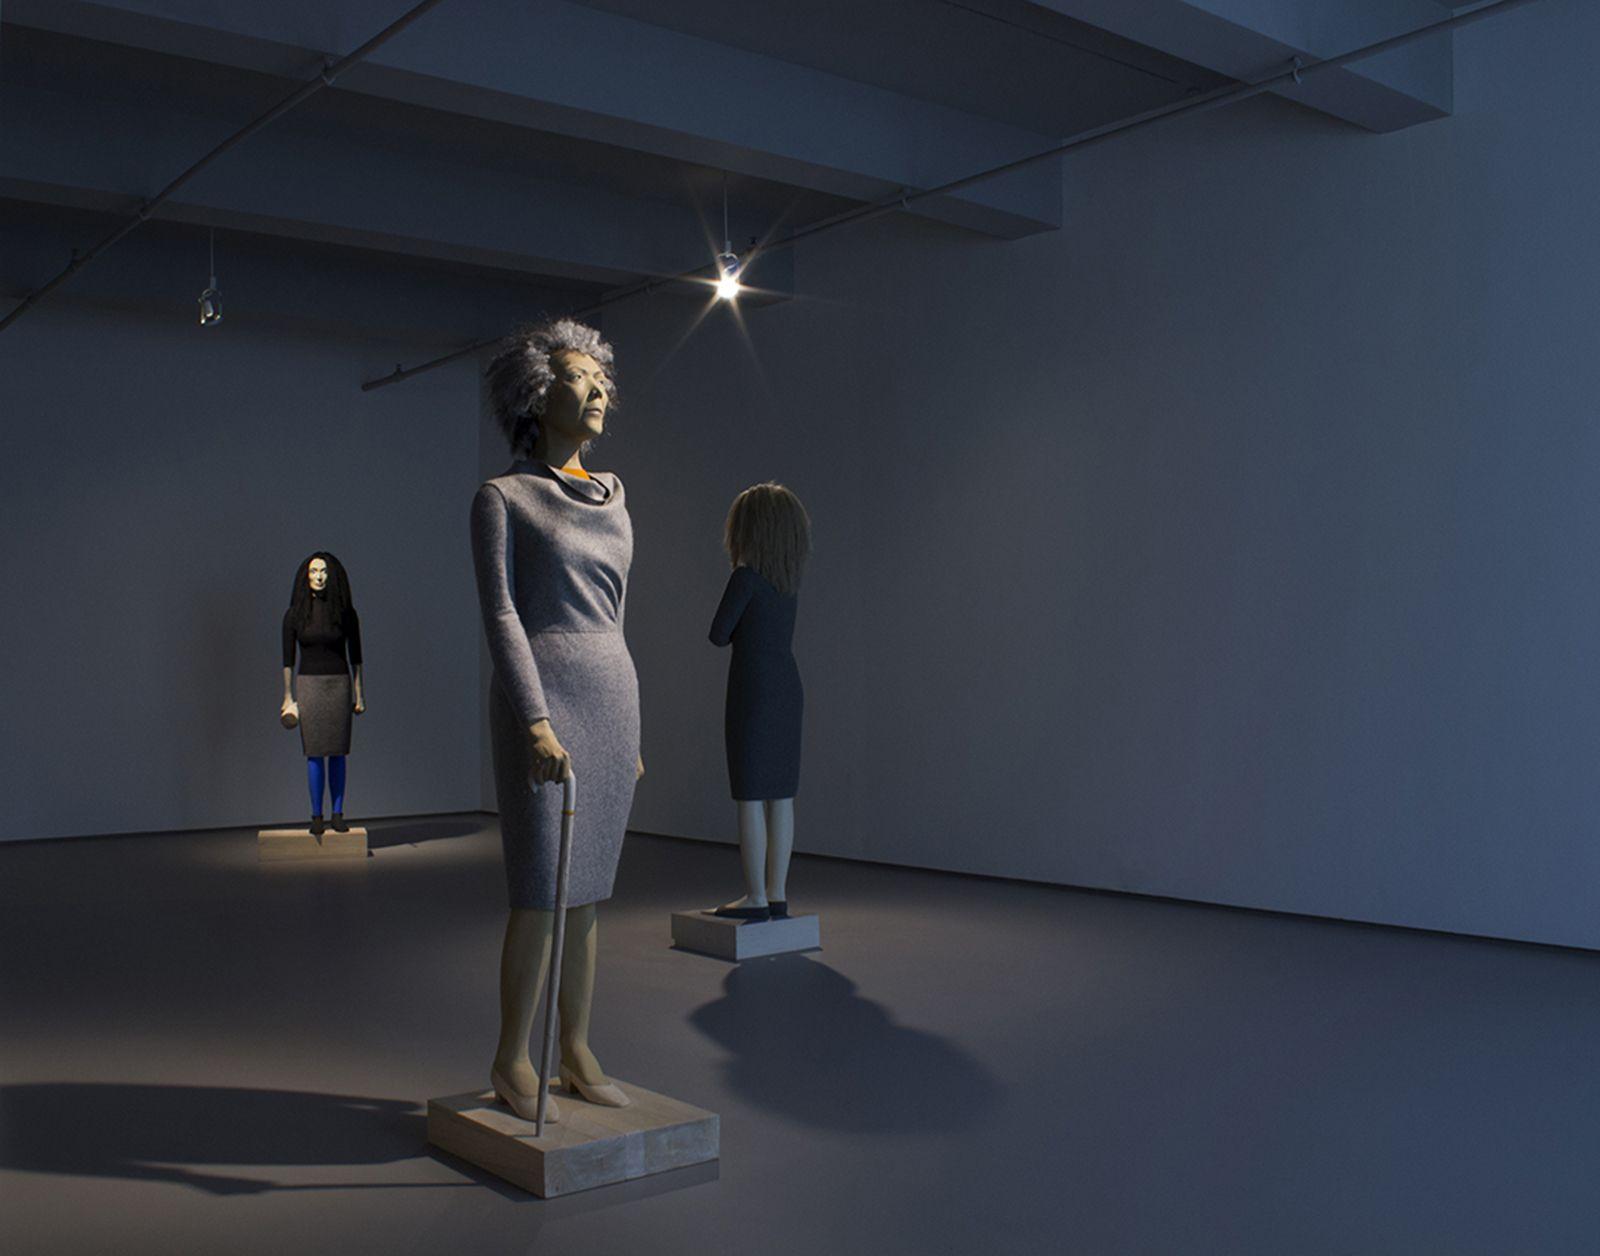 Judith Shea Installation view at Kent Fine Art  May 9 - June 28, 2014